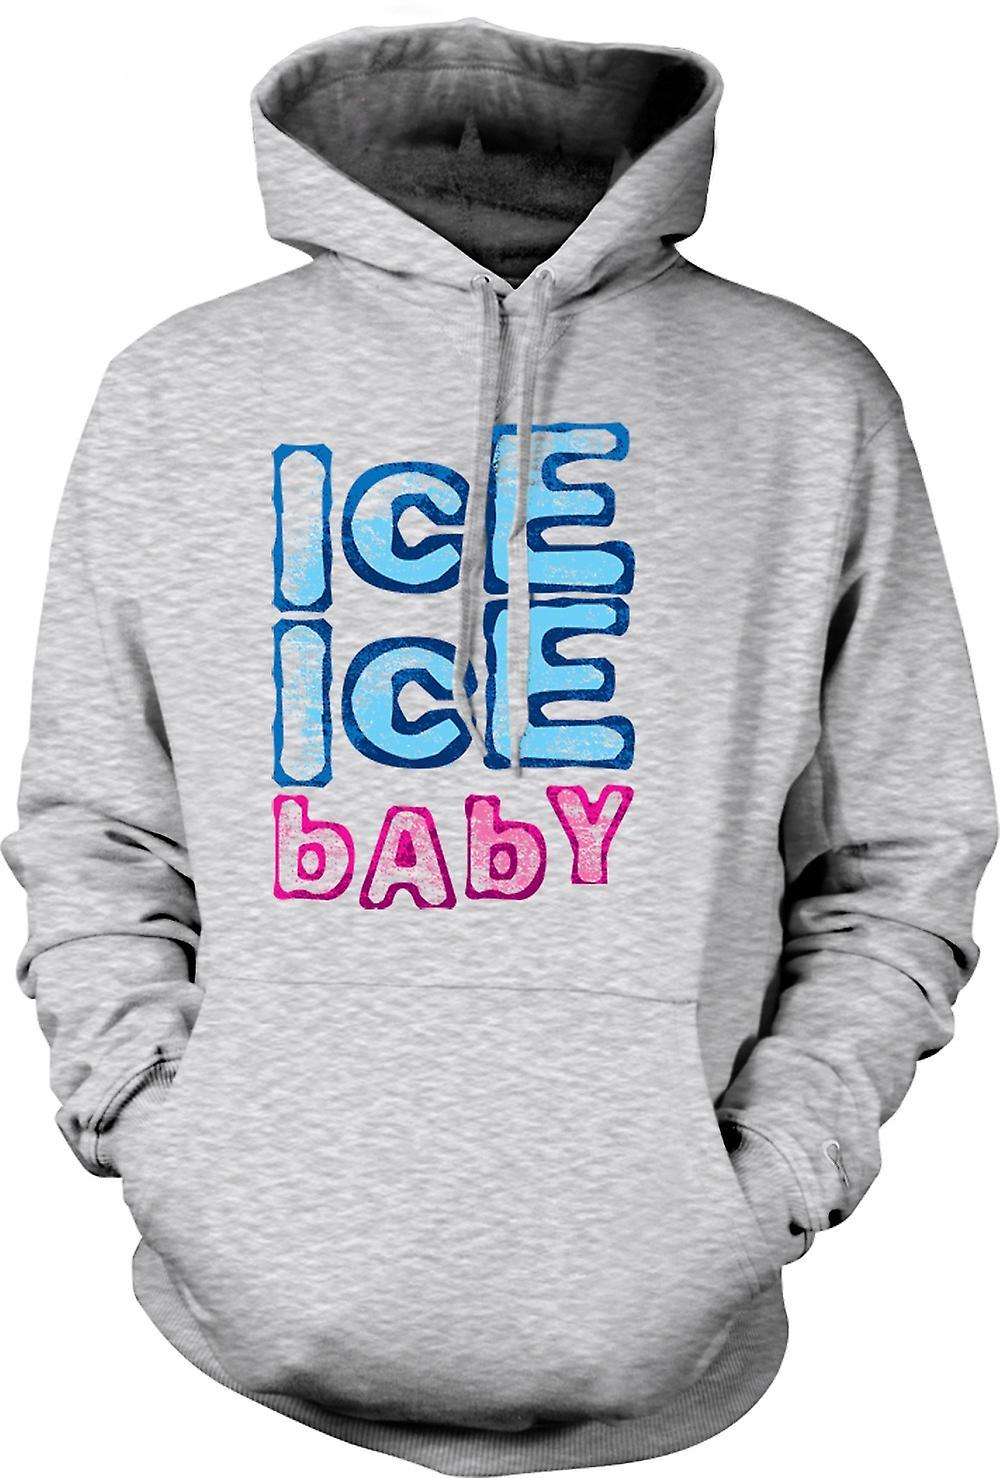 Mens Hoodie - Vanilla Ice - Ice Ice Baby - Funny